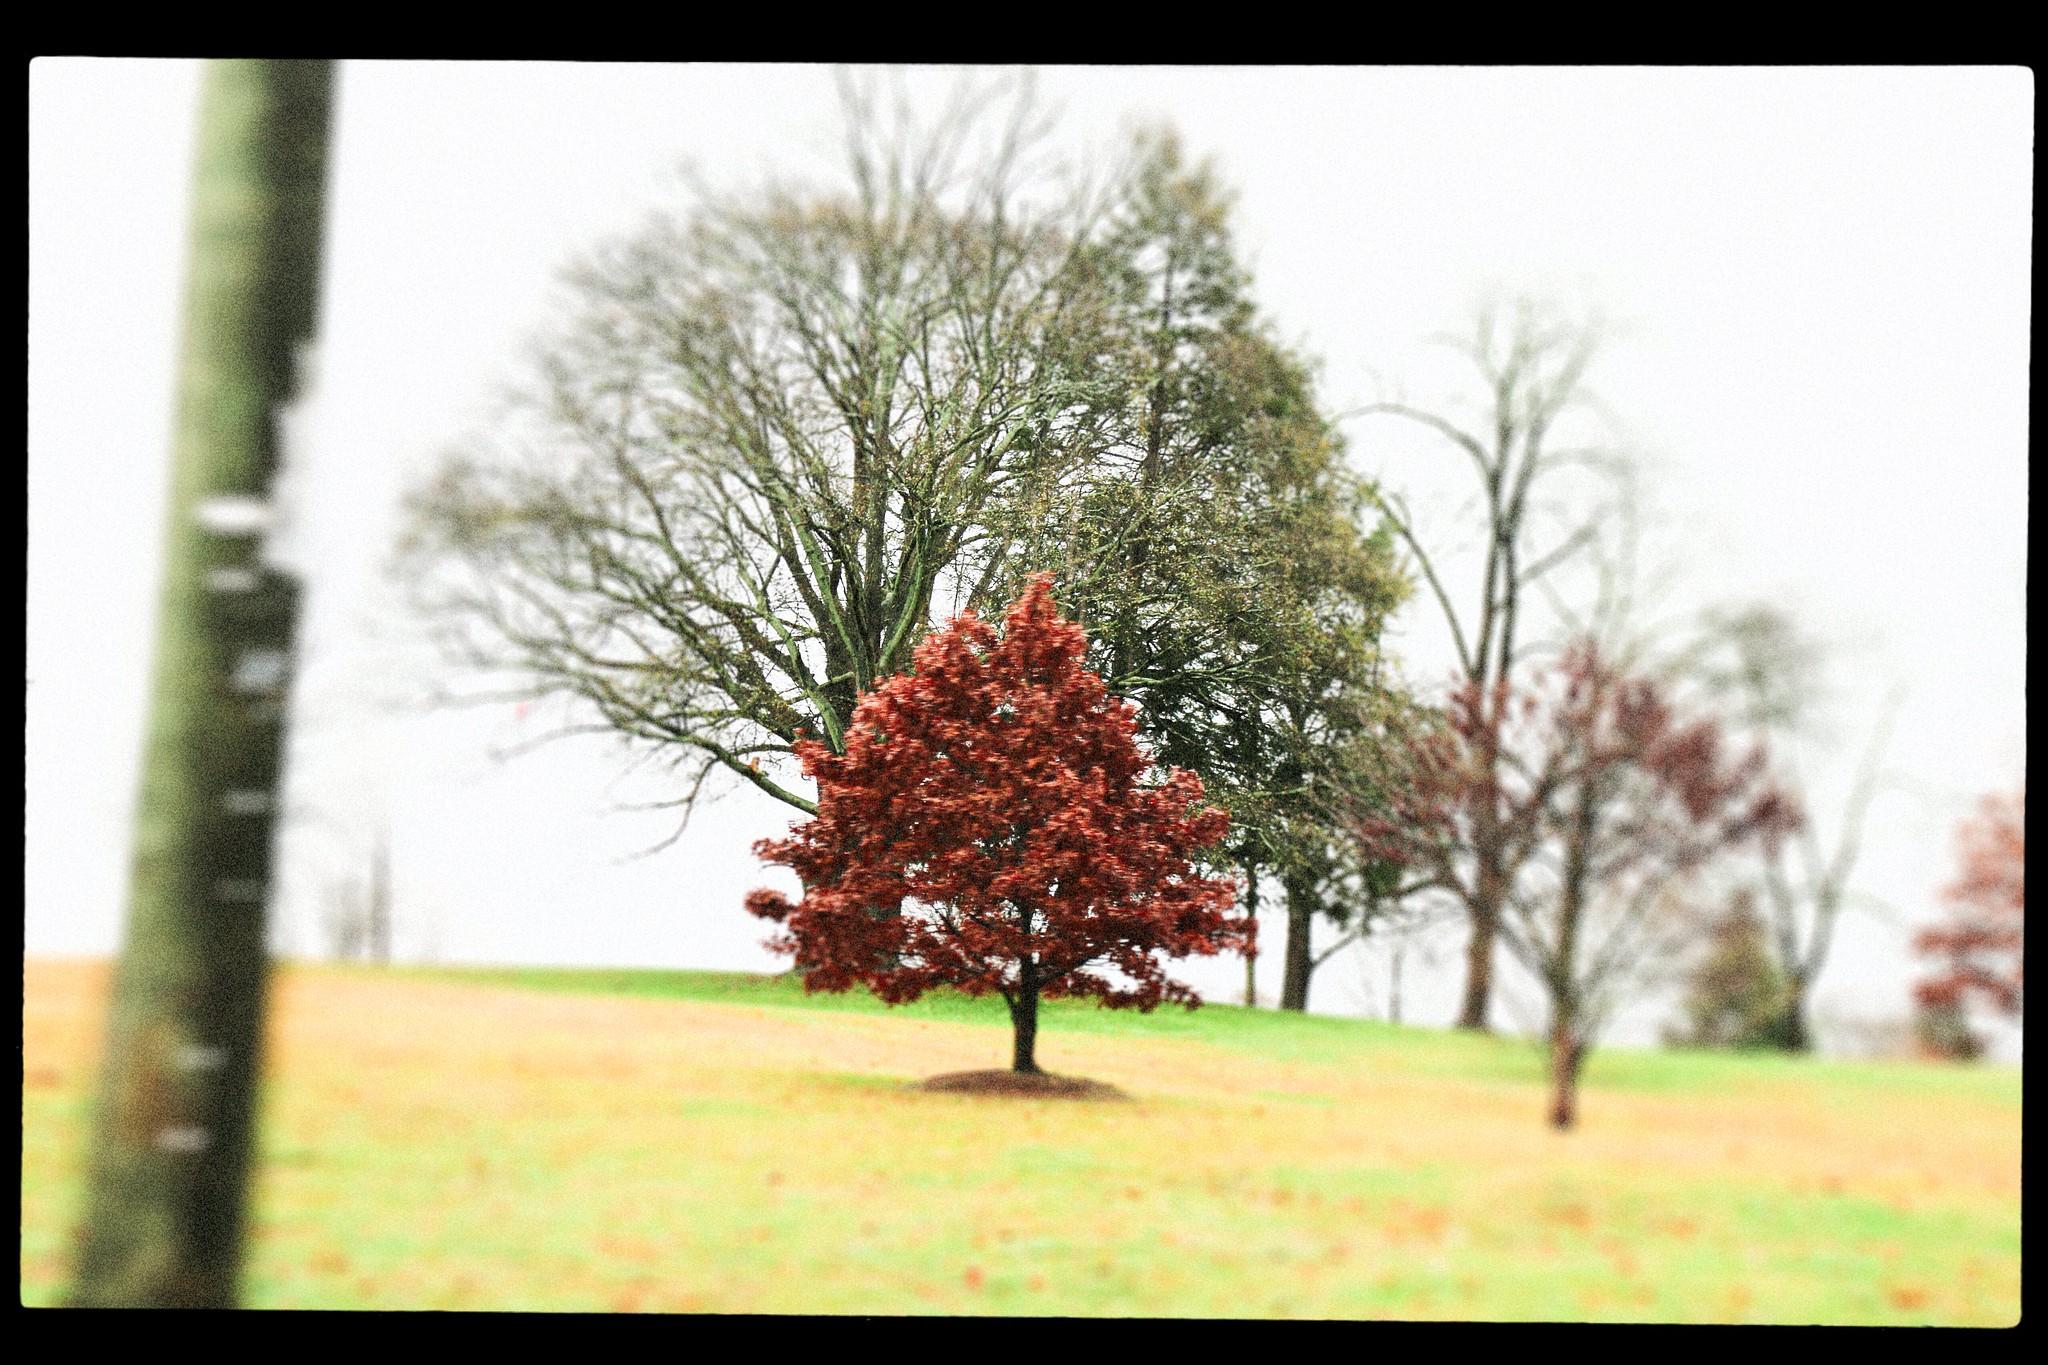 Red Tree. Freedom Park, Moreland Ave. December 2015.